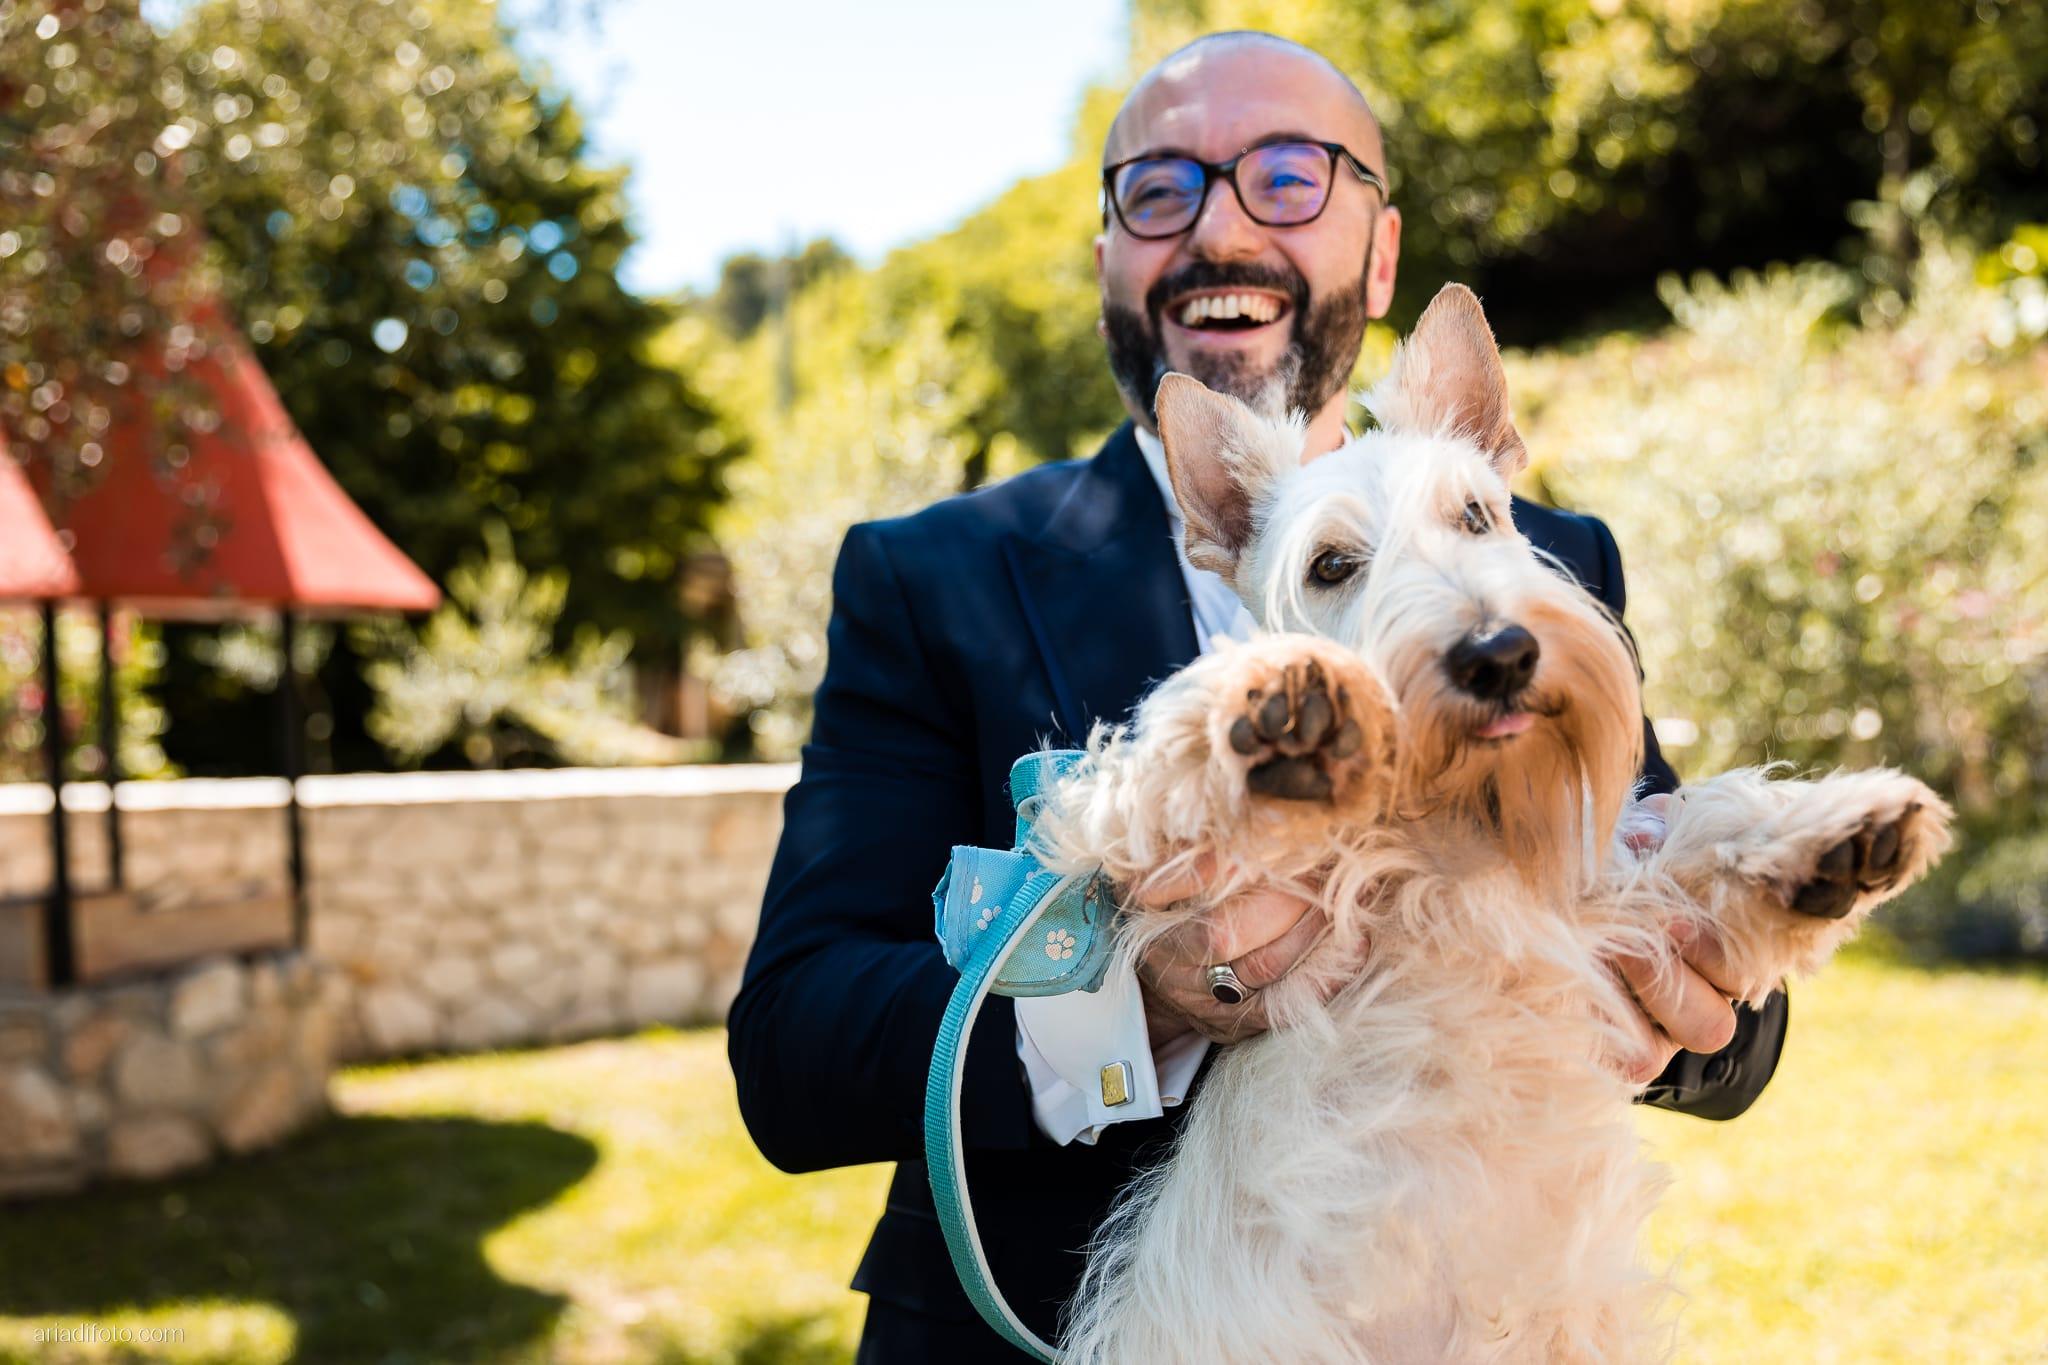 Lavinia Daniele Matrimonio Medea Gorizia Villa Elodia Trivignano Udinese Udine preparativi sposo cane scottish terrier